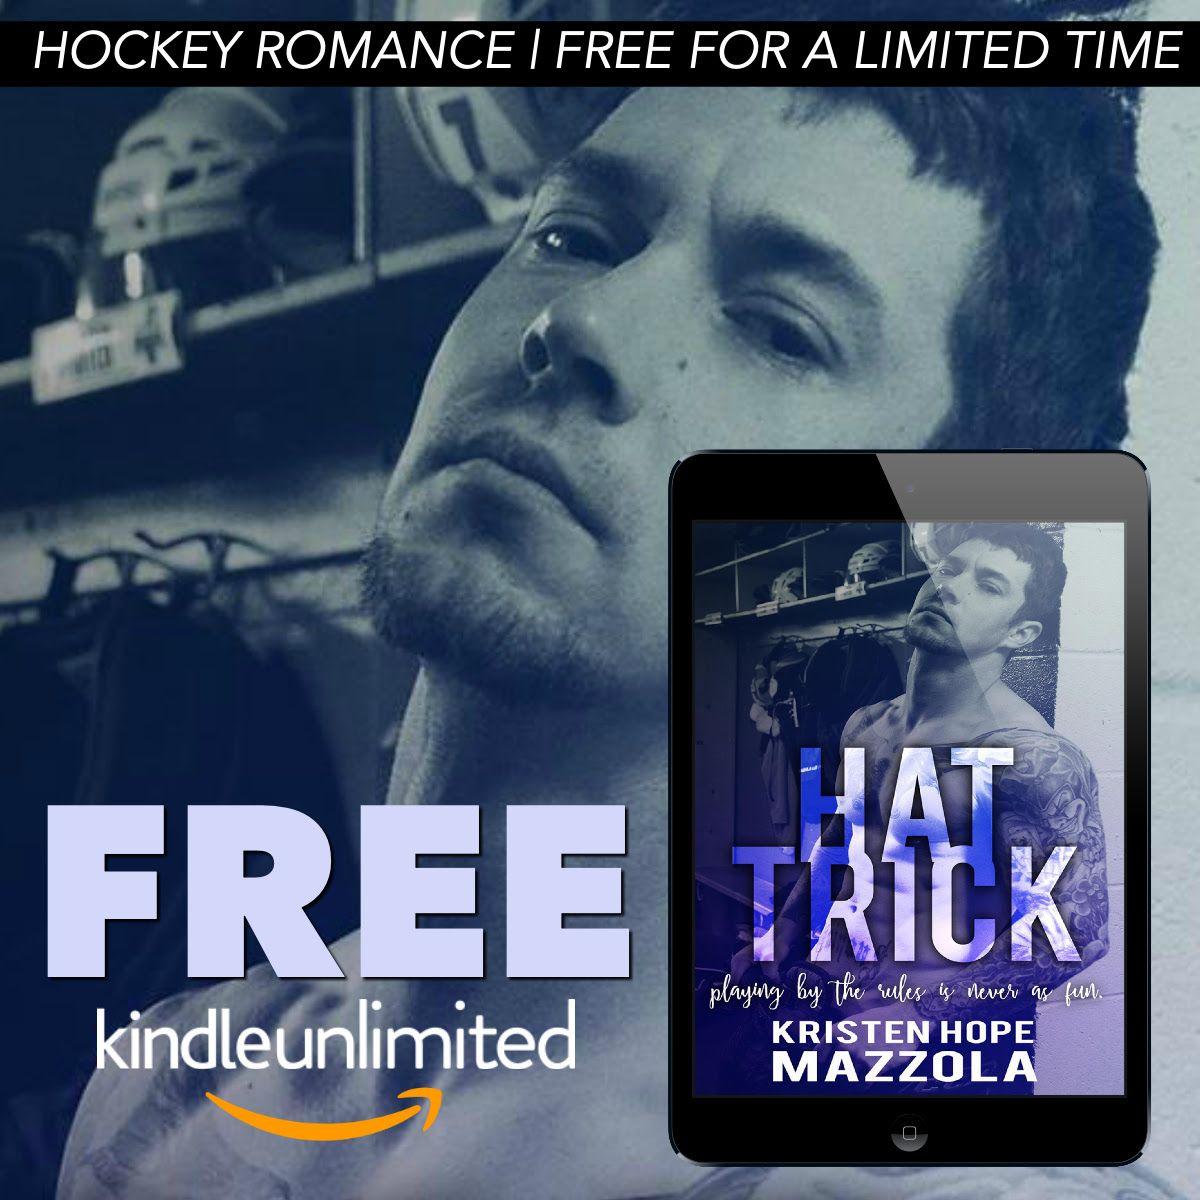 I Love Romance Freebie Alert Hat Trick By Kristen Hope Mazzola Book Deals Book Lovers Author